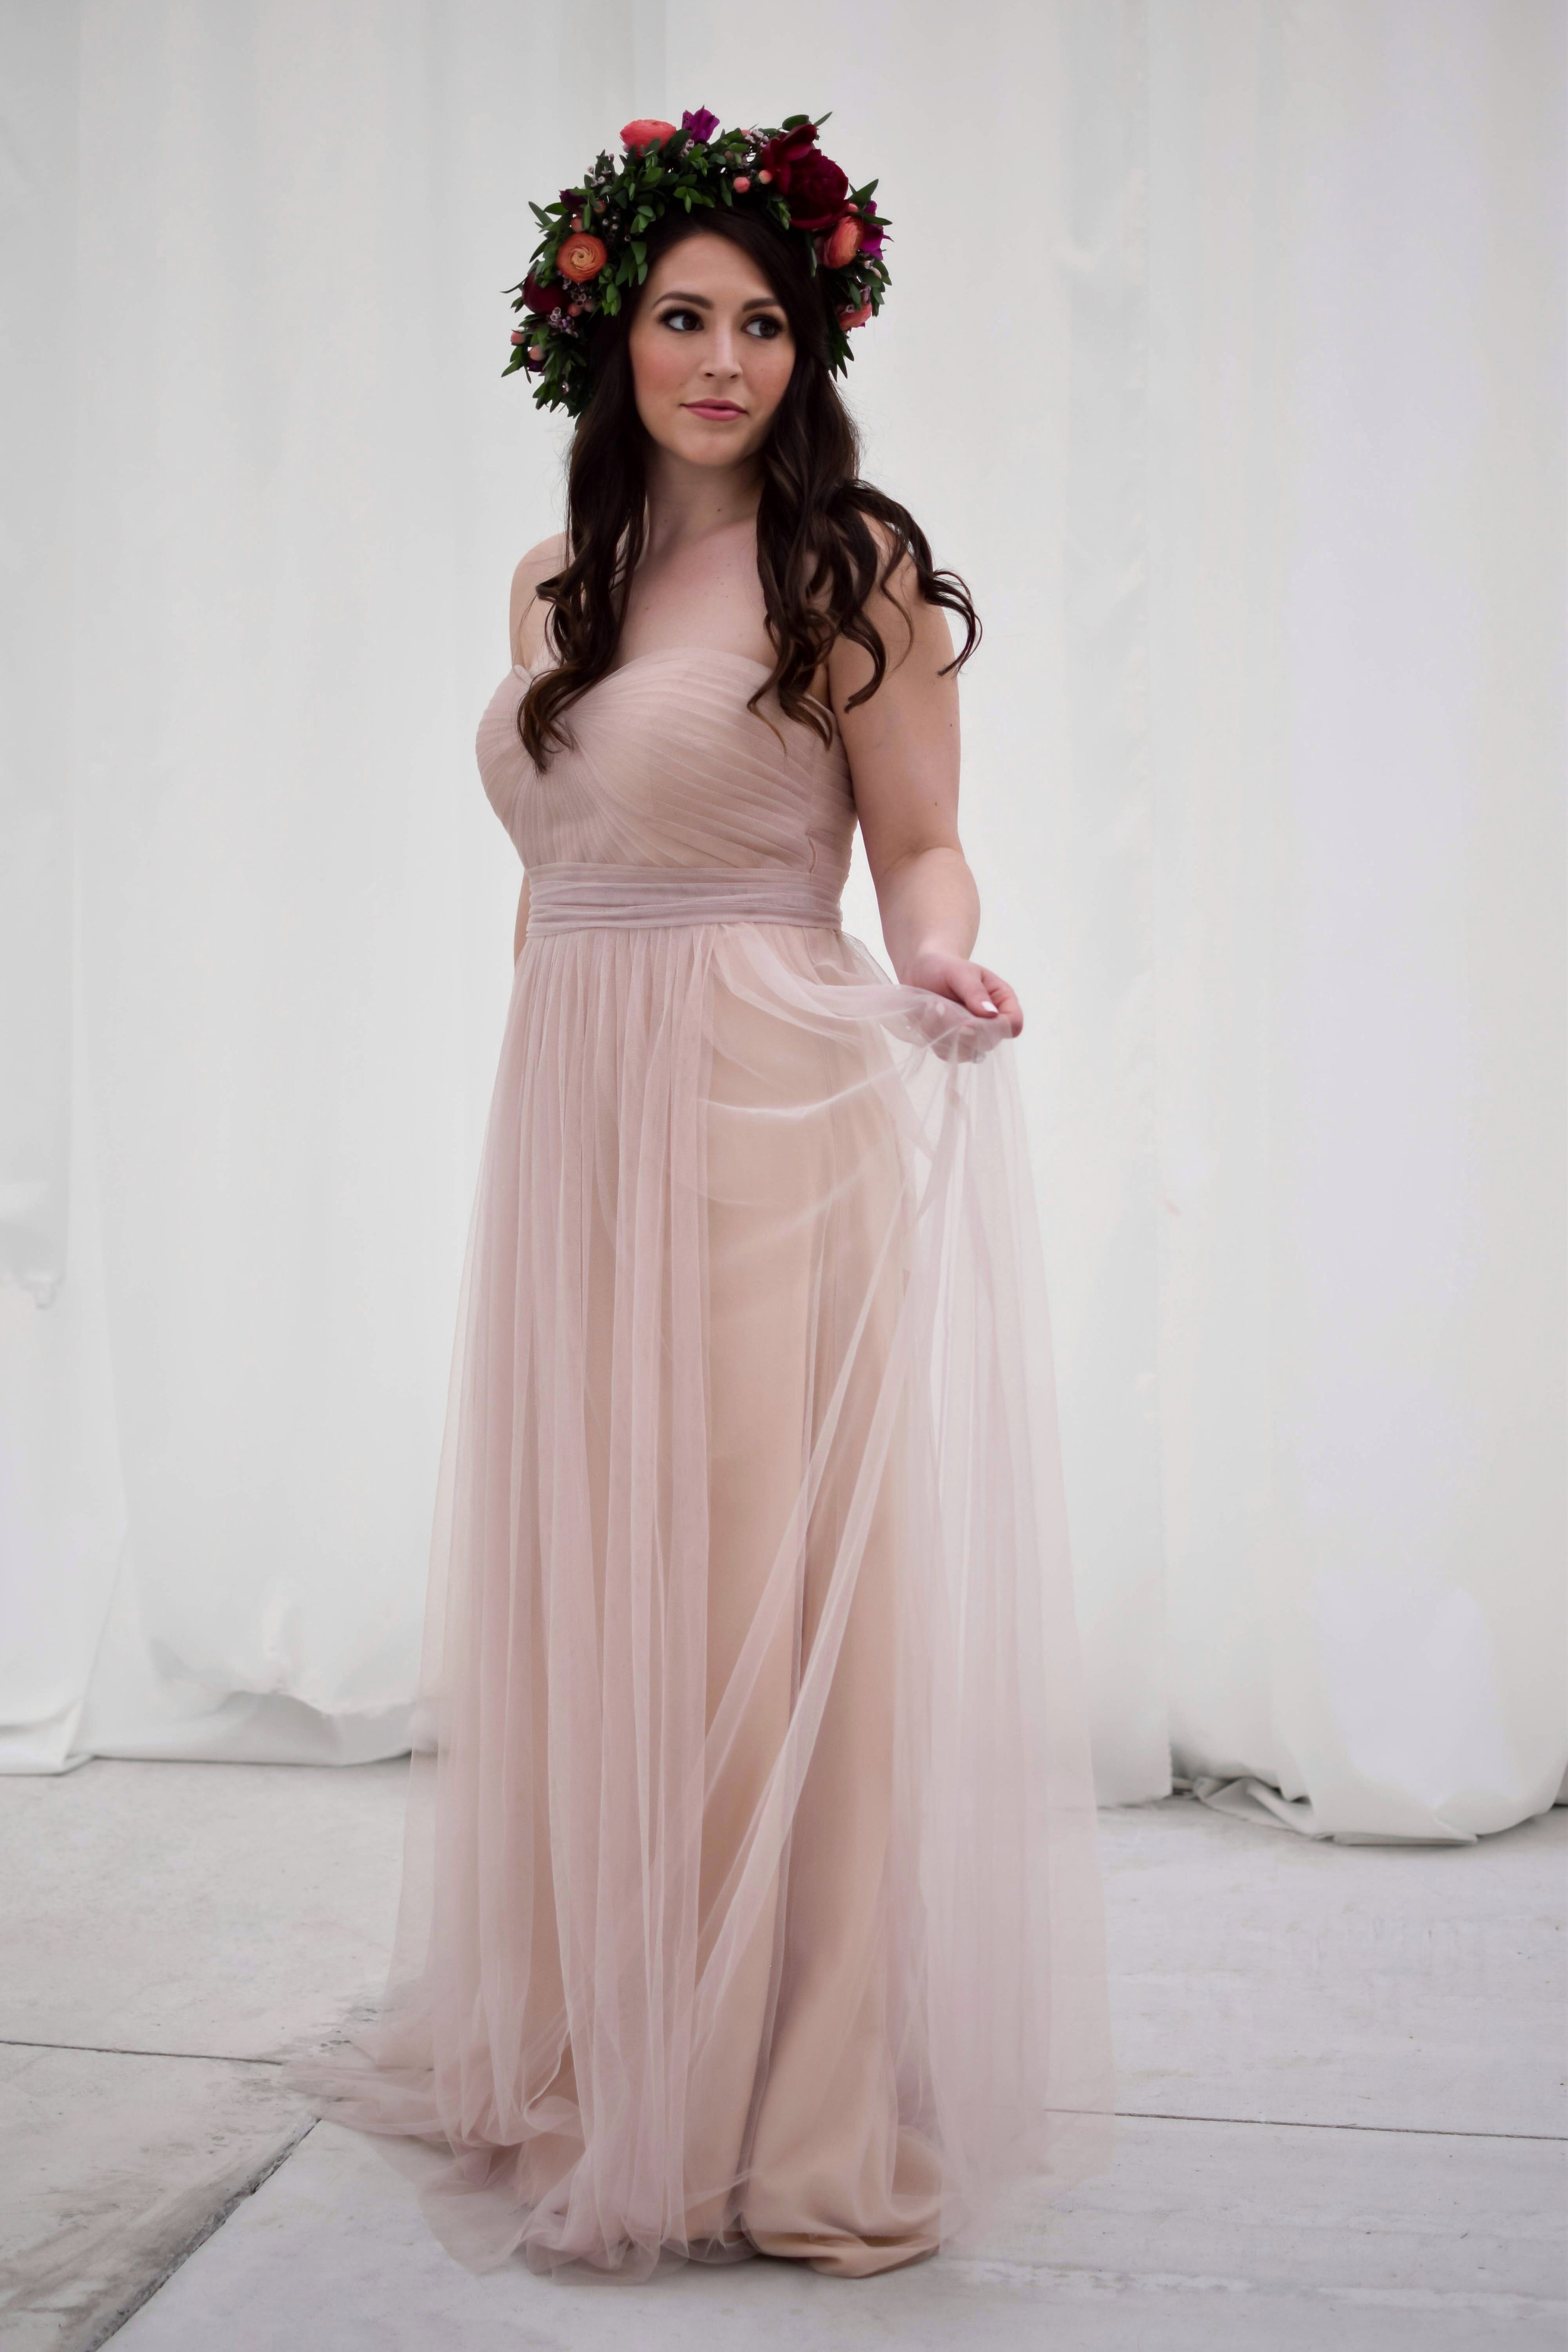 Bridal Looks for Less with eBay | Pine Barren Beauty | styled bridal shoot, bridal dress ideas, bridal party dress ideas, bhldn bridesmaid dress, tulle dress, flower crown, flower crown ideas, bridal flower crown, bridal hair, natural bridal makeup, boho bridal look